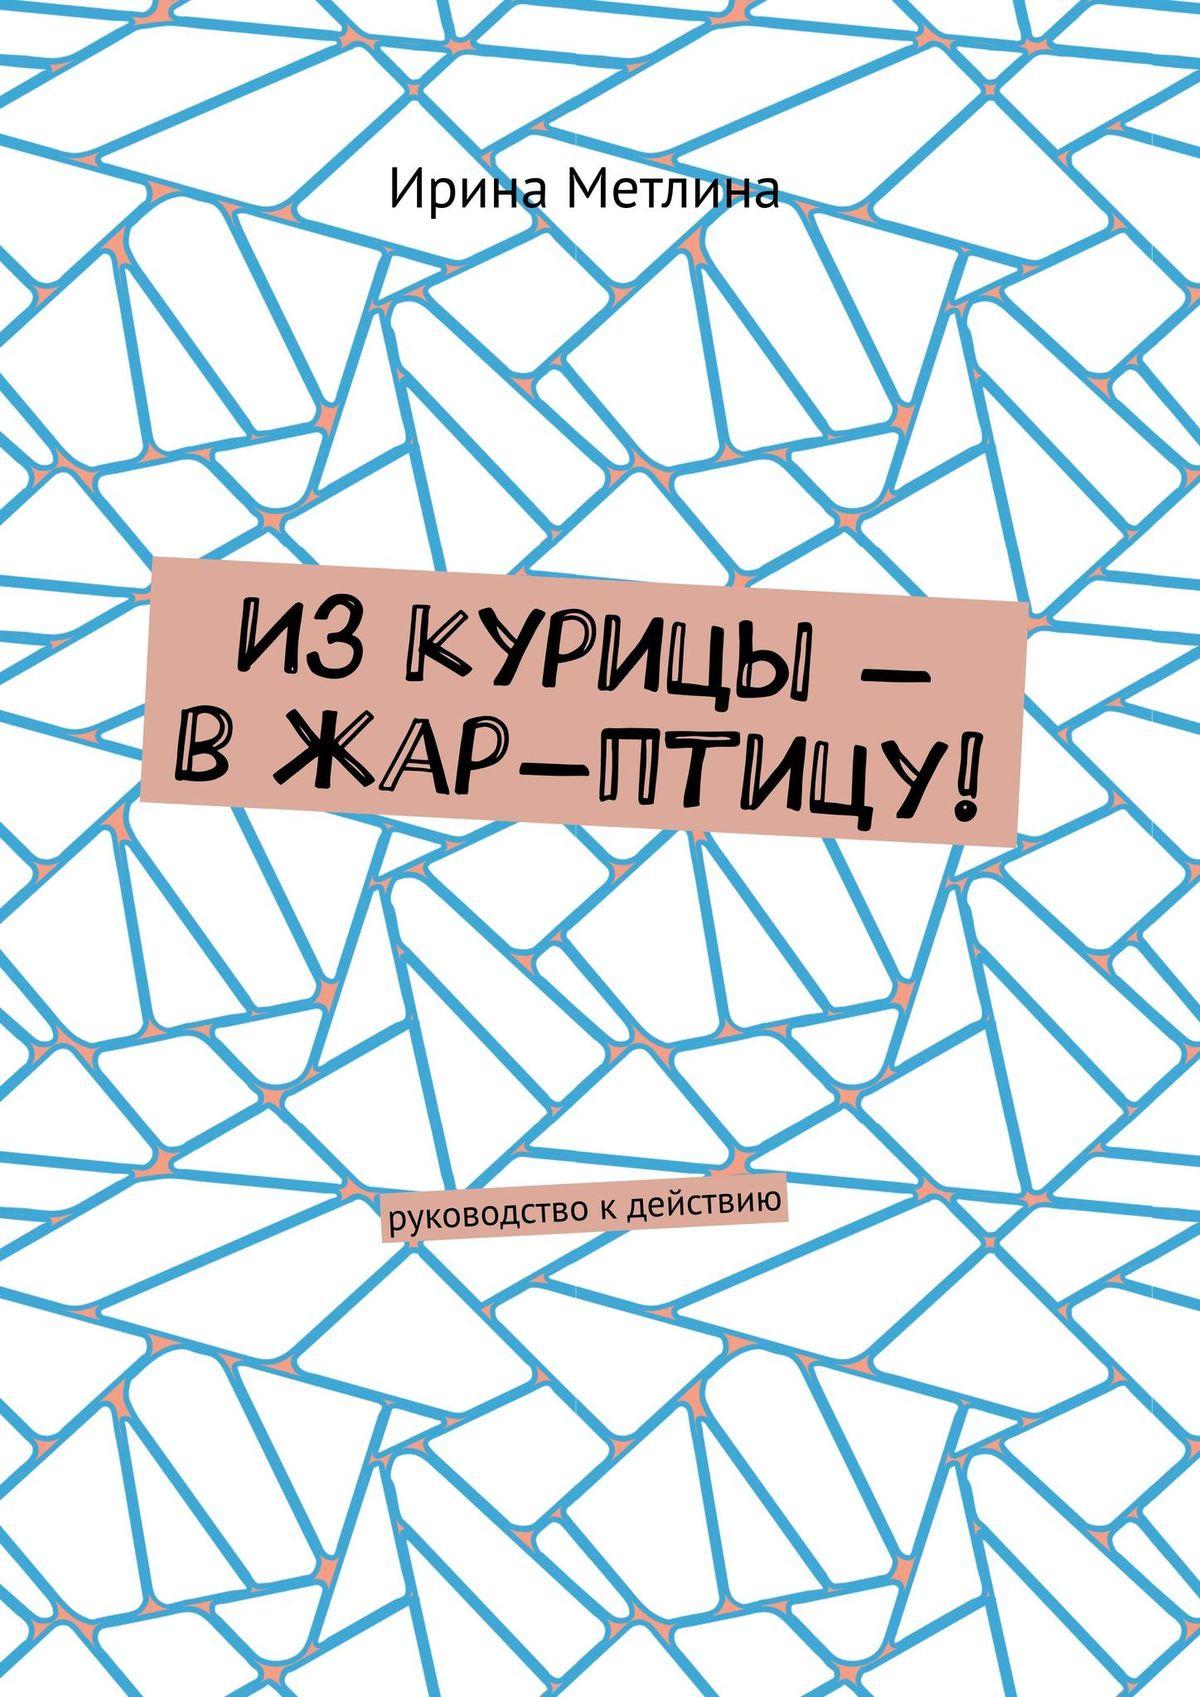 Ирина Метлина Изкурицы– вжар-птицу! Руководство кдействию